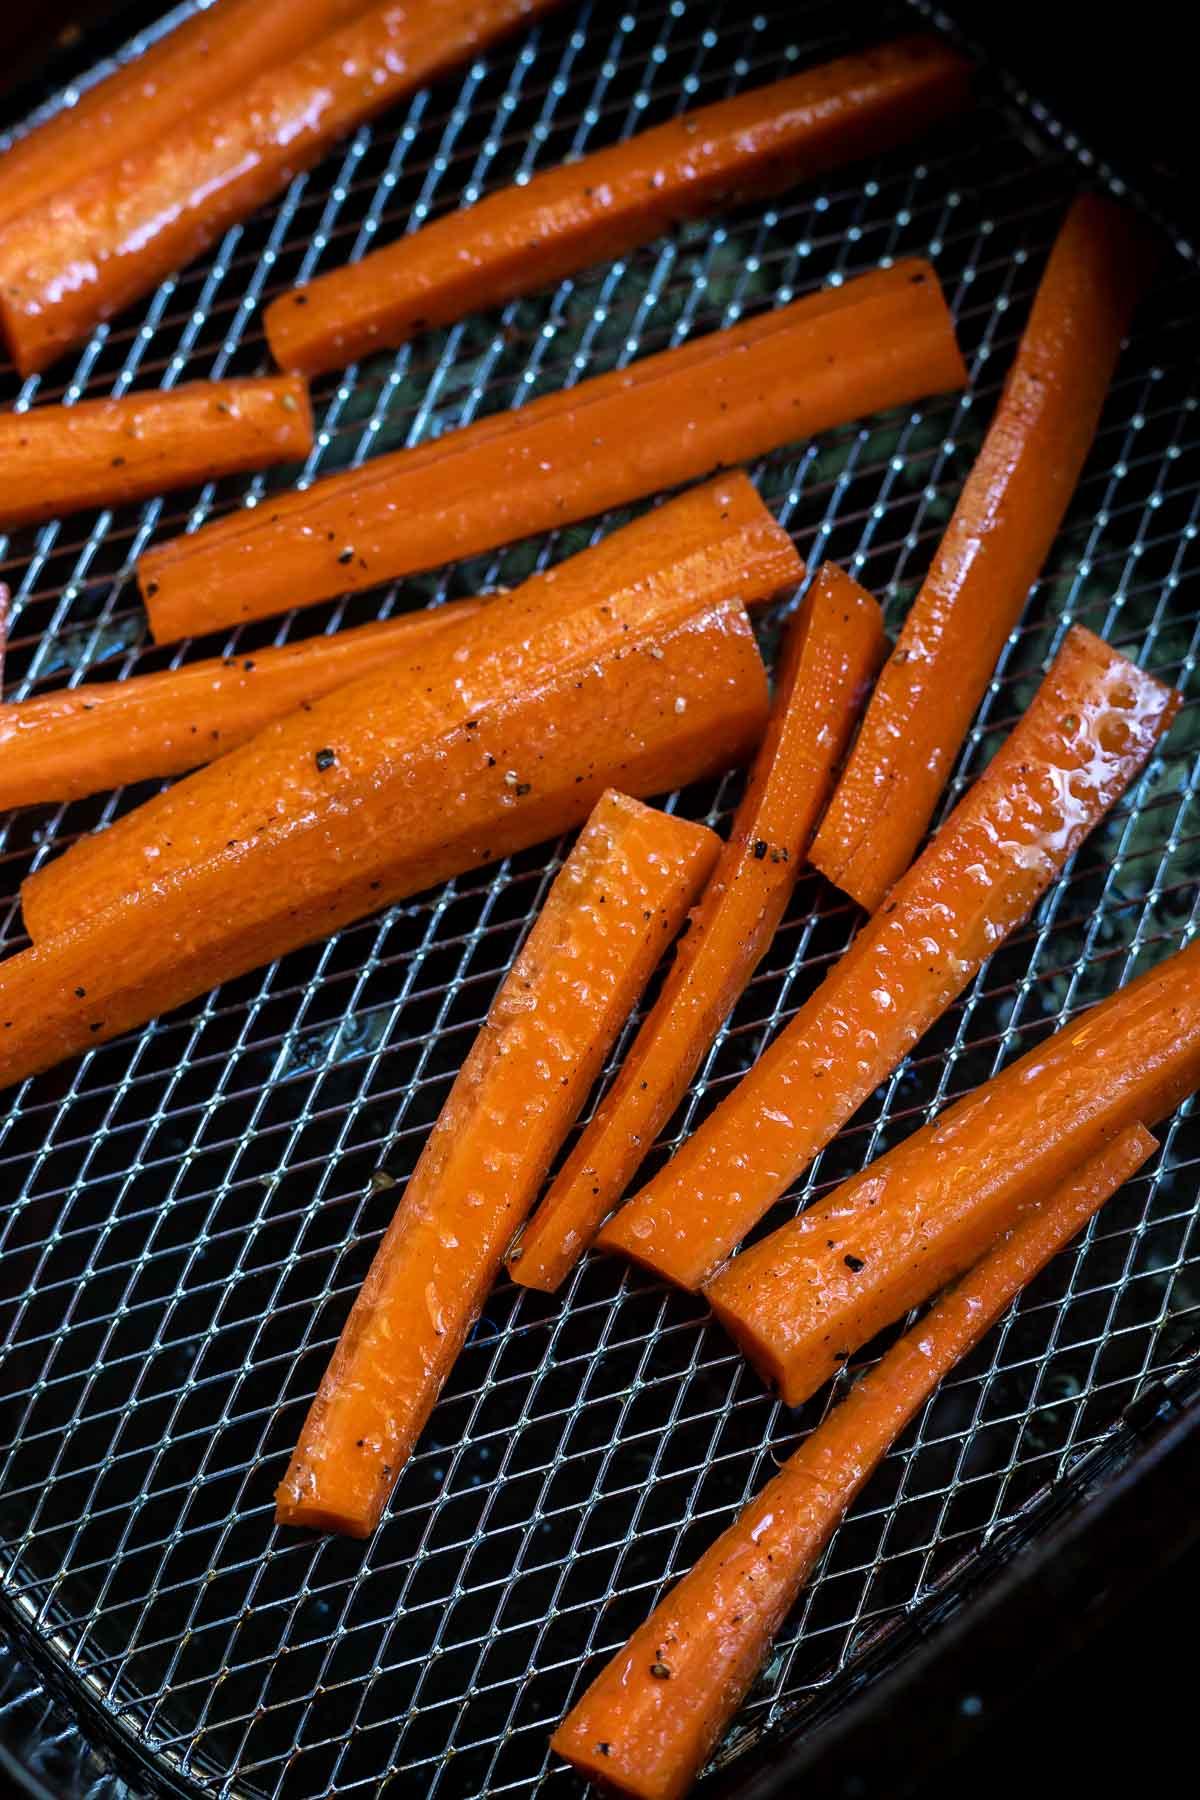 raw carrot sticks in air fryer basket